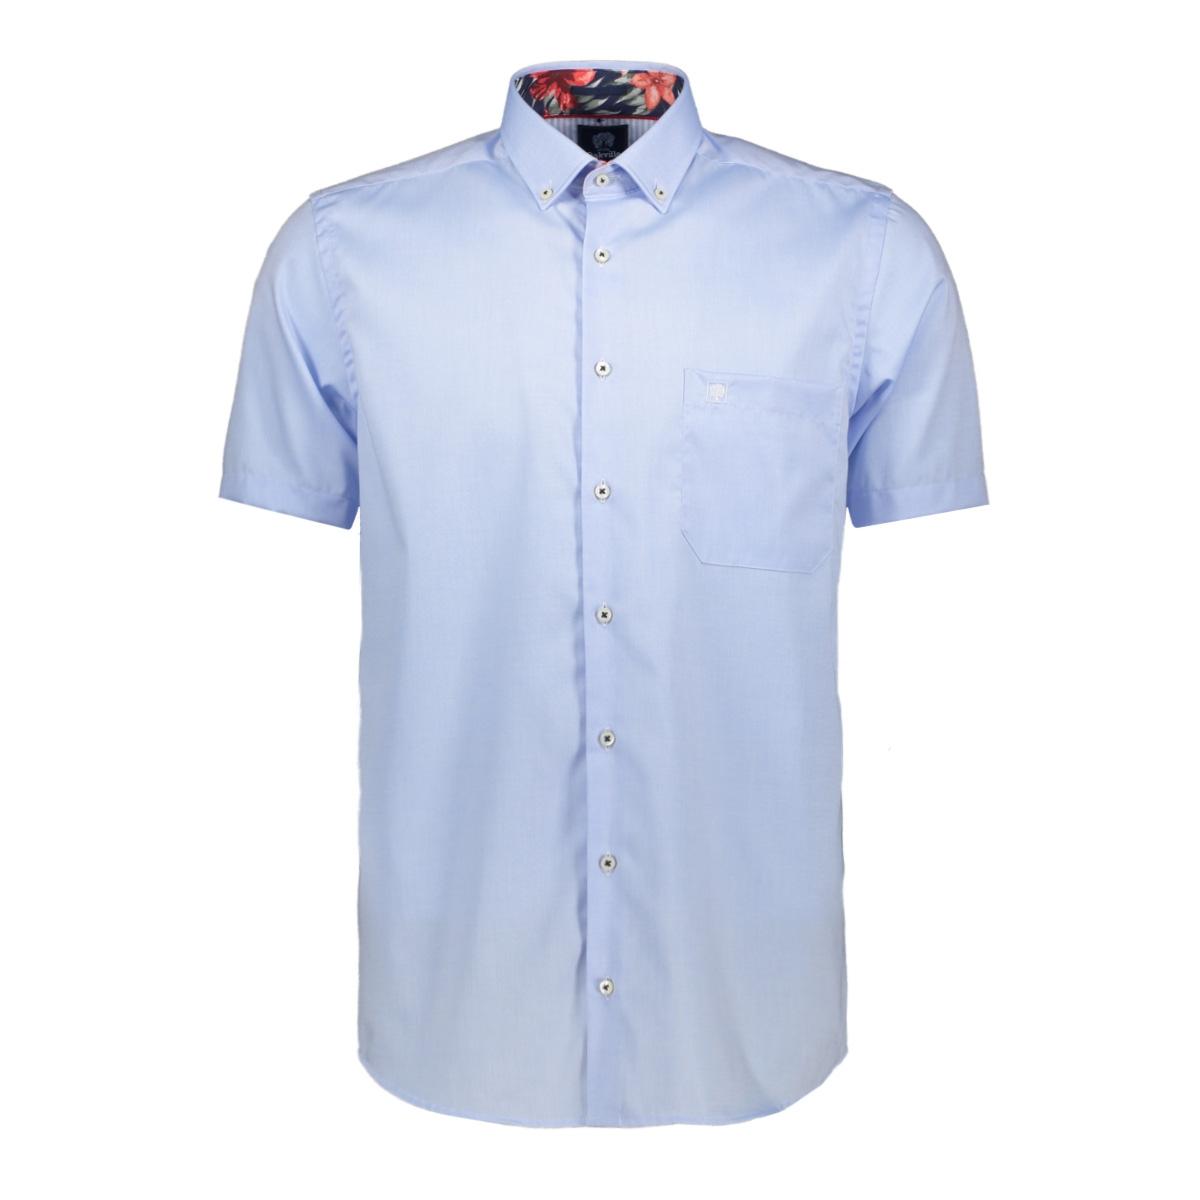 88 31522 ov106 0 marnelli overhemd 015